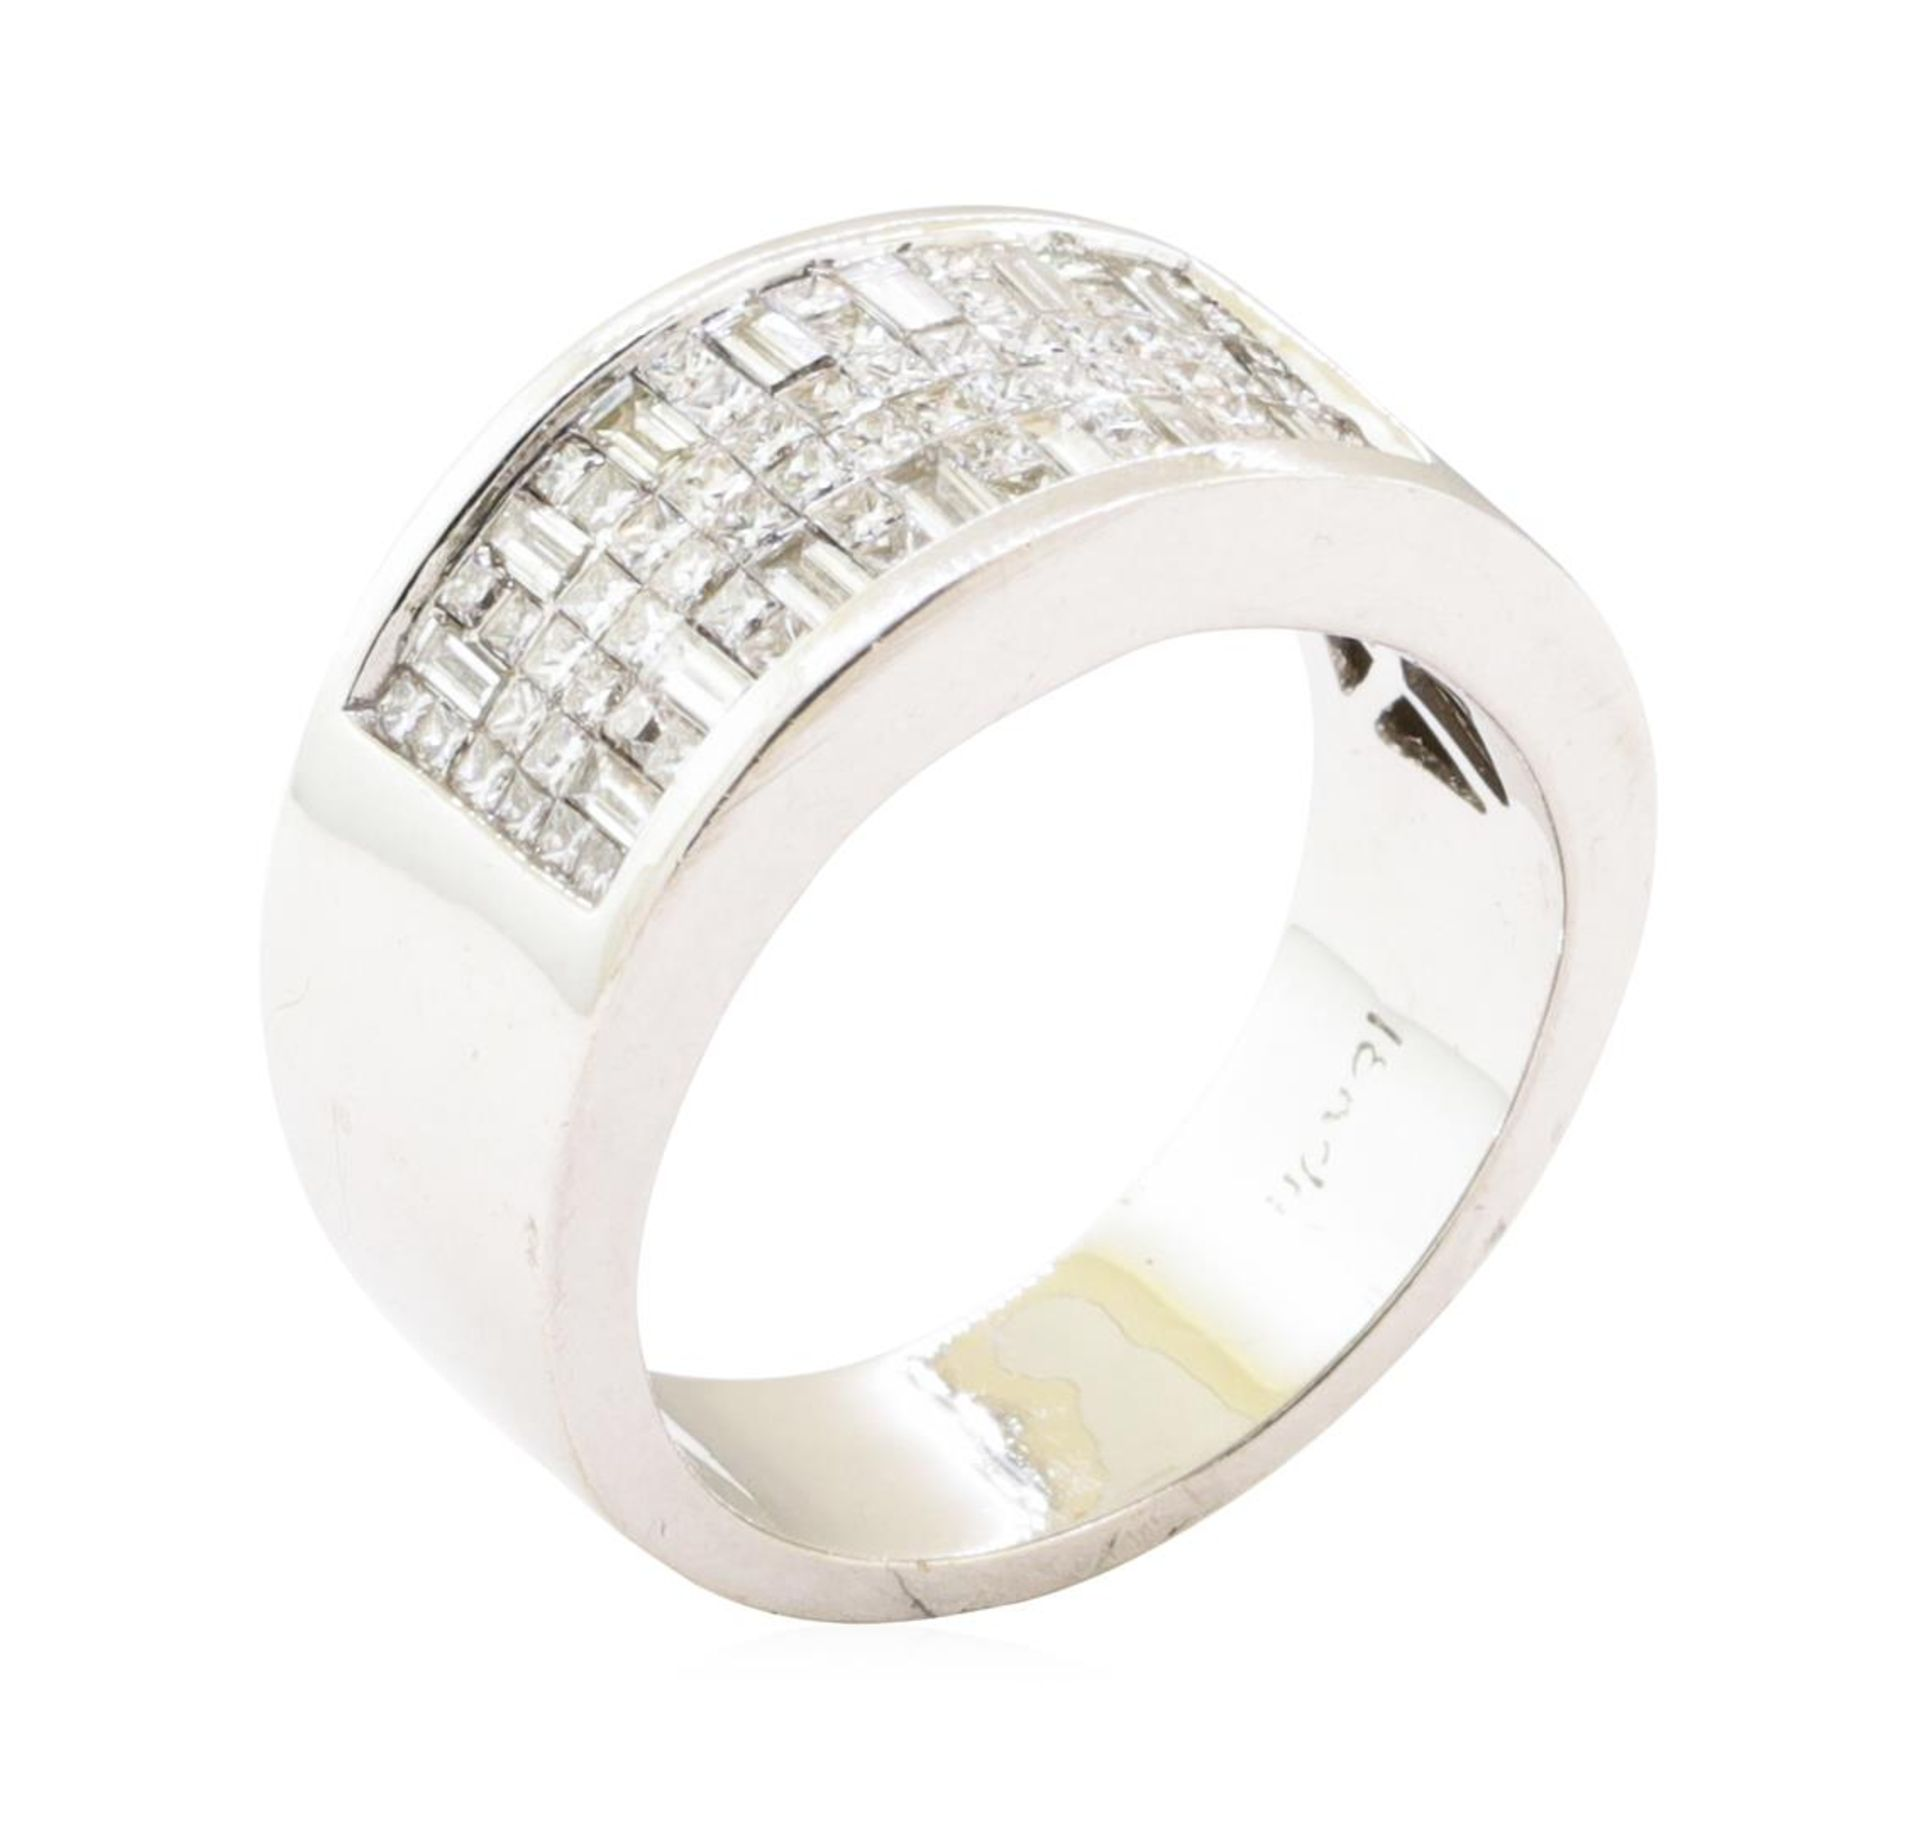 1.07 ctw Diamond Ring - 18KT White Gold - Image 4 of 4